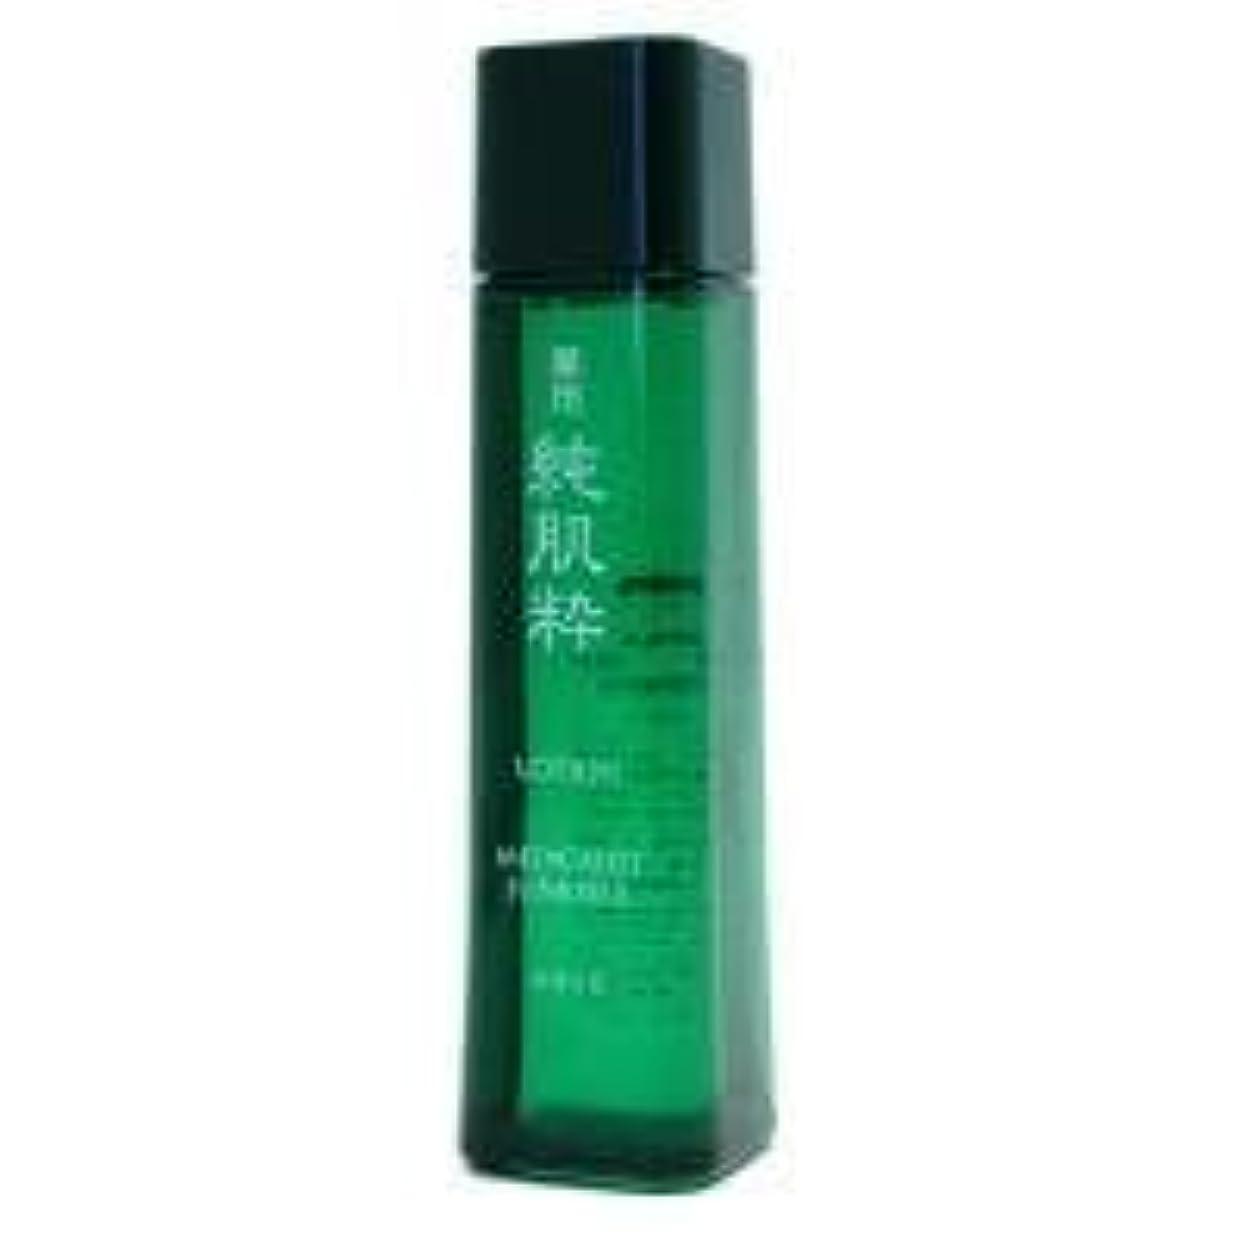 コーセー 薬用 純肌粋 化粧水 150ml